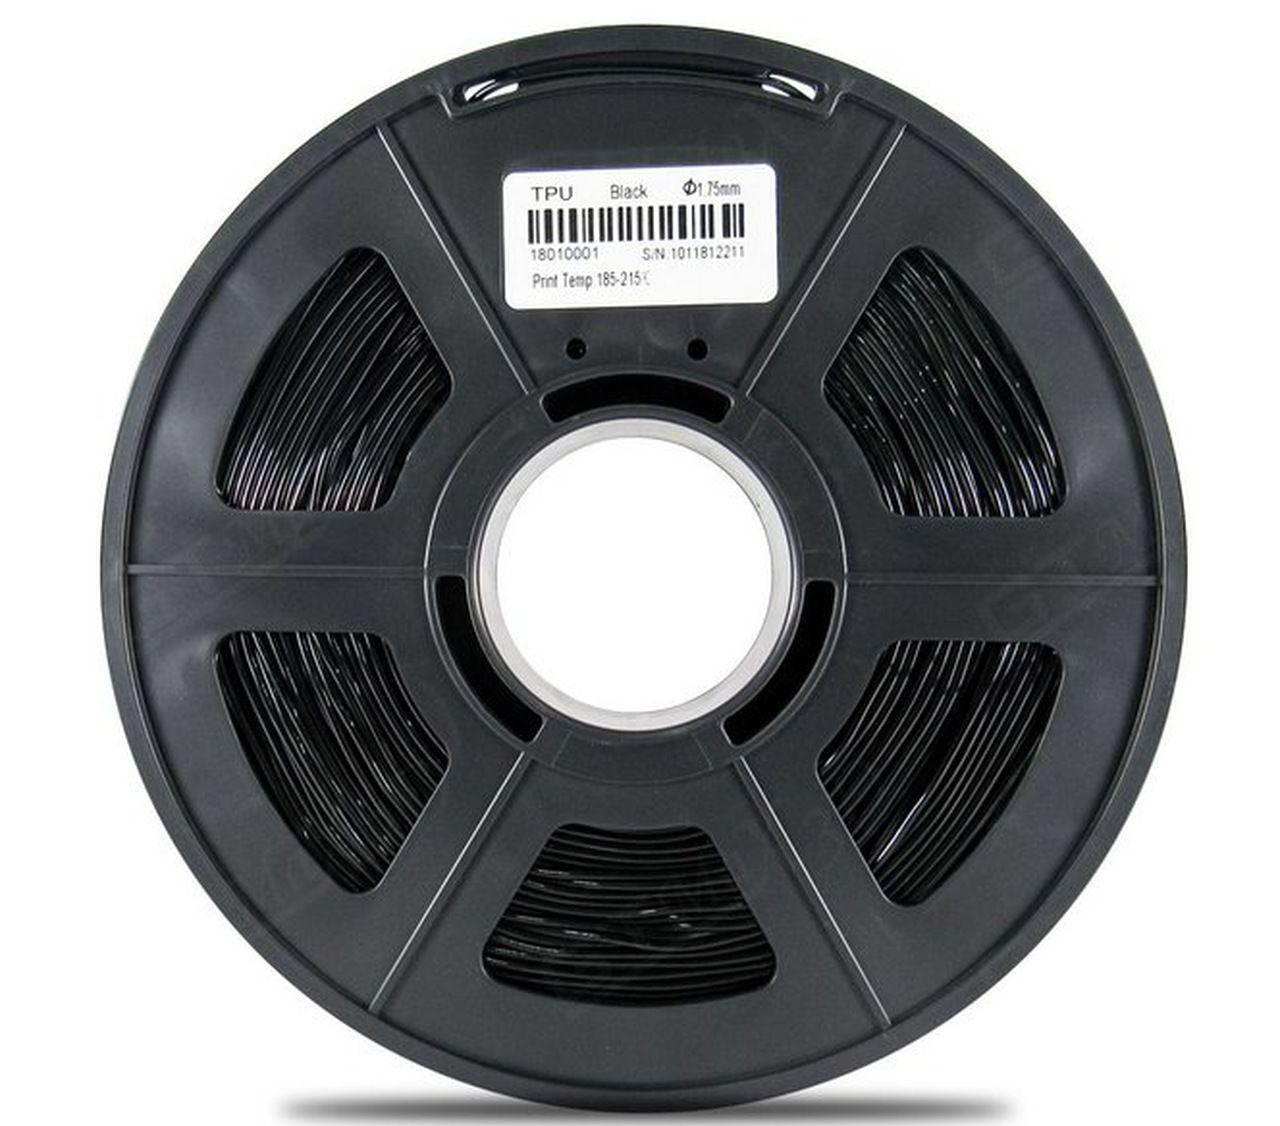 Filamento Flexível TPU - Preto - GTMax3D - 1.75mm - 500g